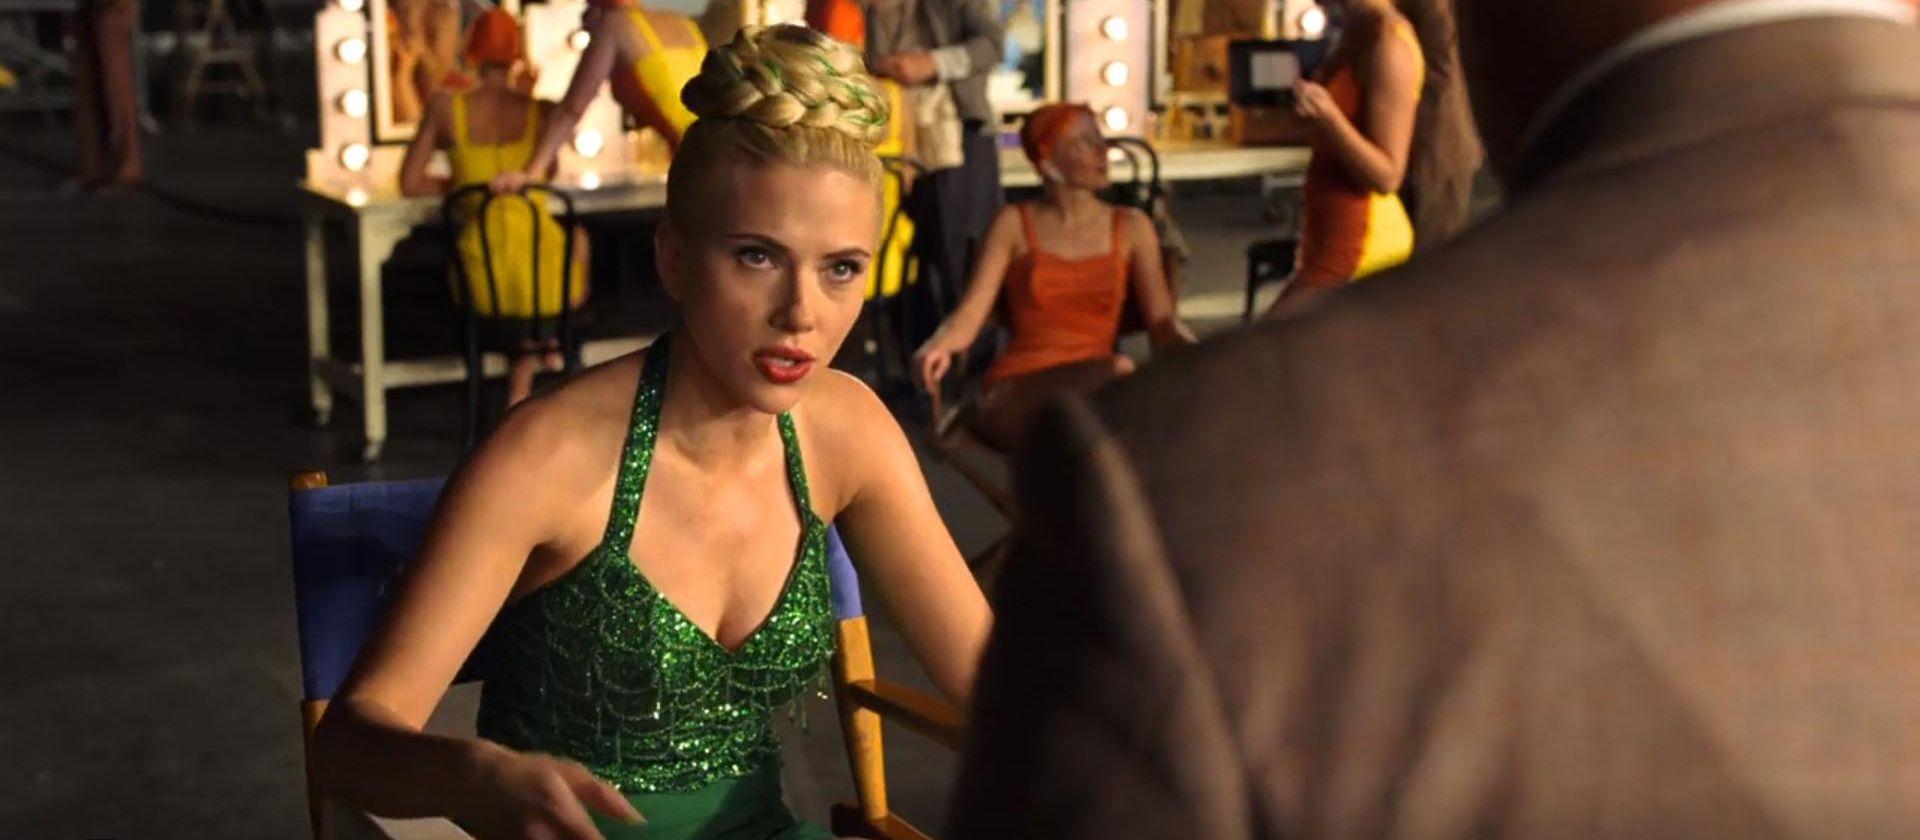 VIDEO: URNEBES Objavljen novi trailer za 'Hail, Caesar' braće Cohen